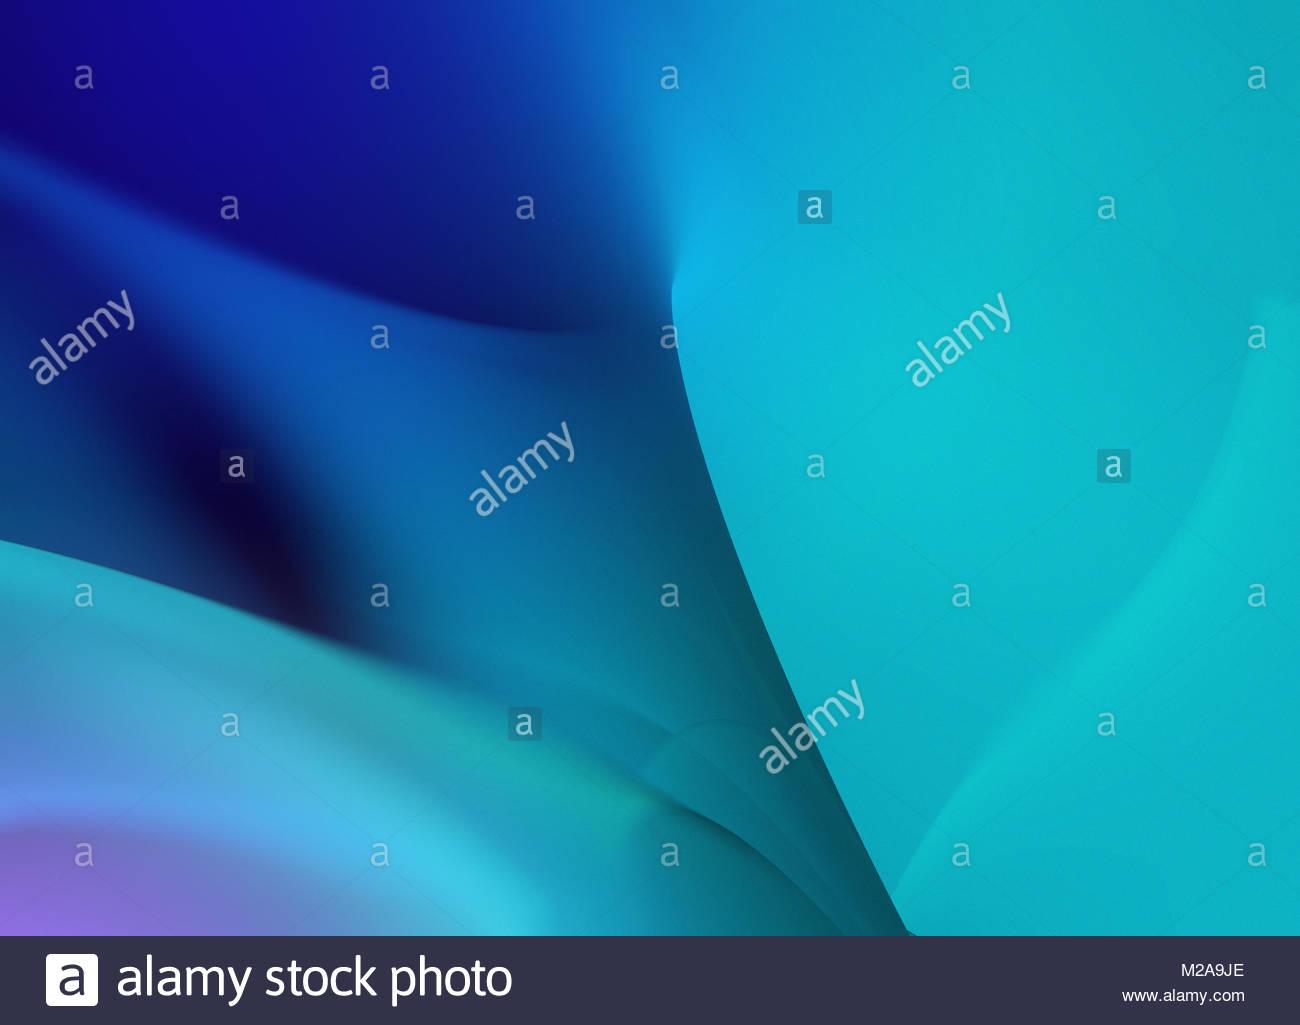 Resumen Antecedentes patrón azul Imagen De Stock